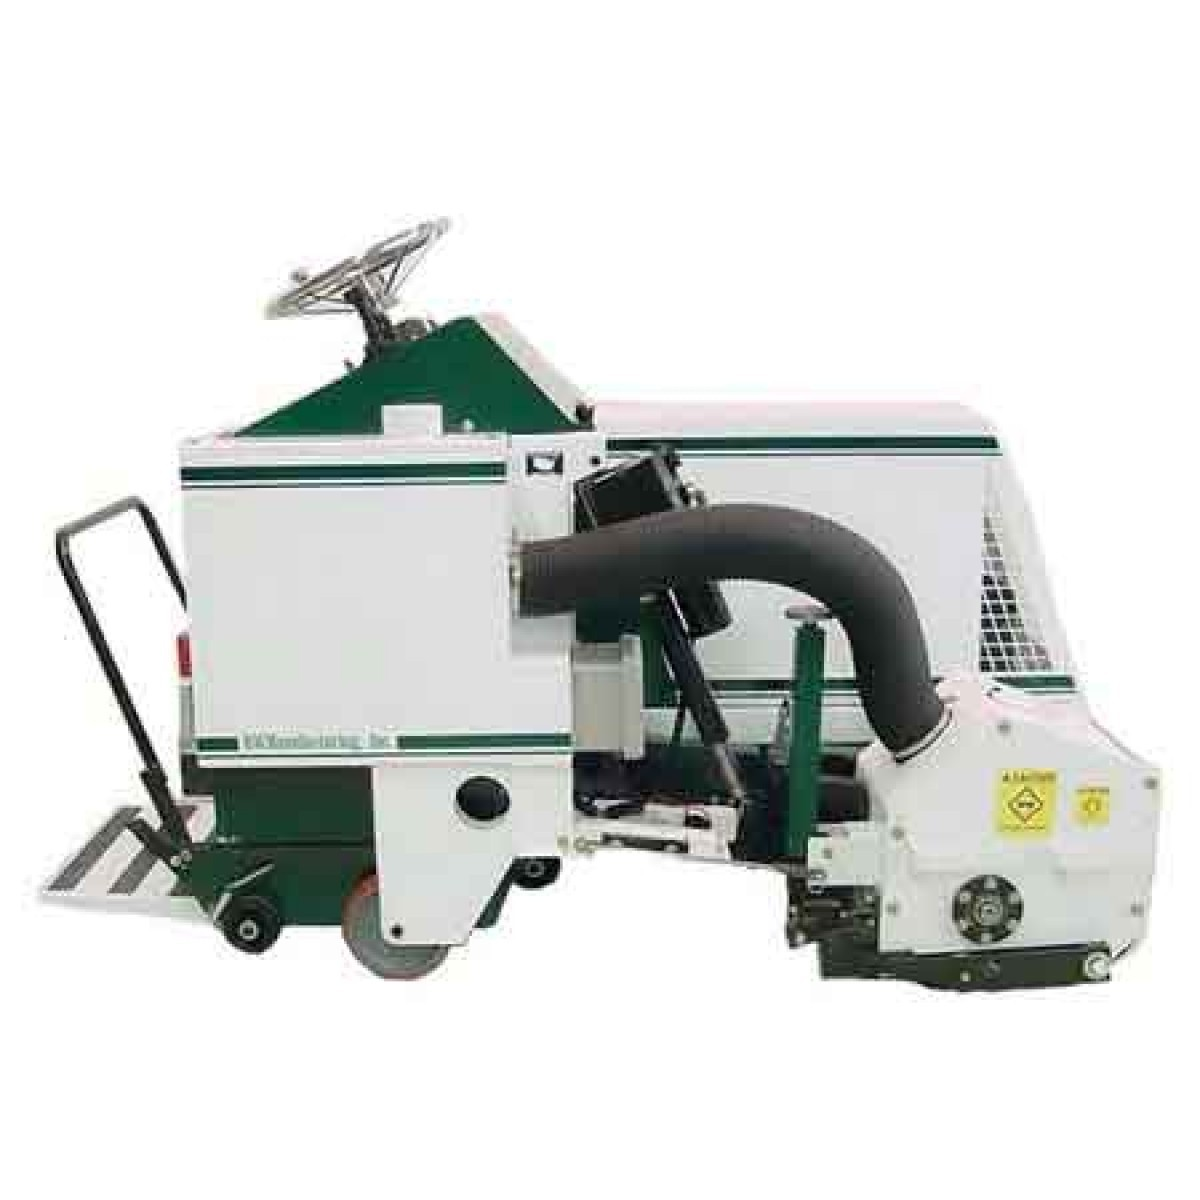 Bw Manufacturing Scb 1200 Series Grinder System Wiring Diagrams